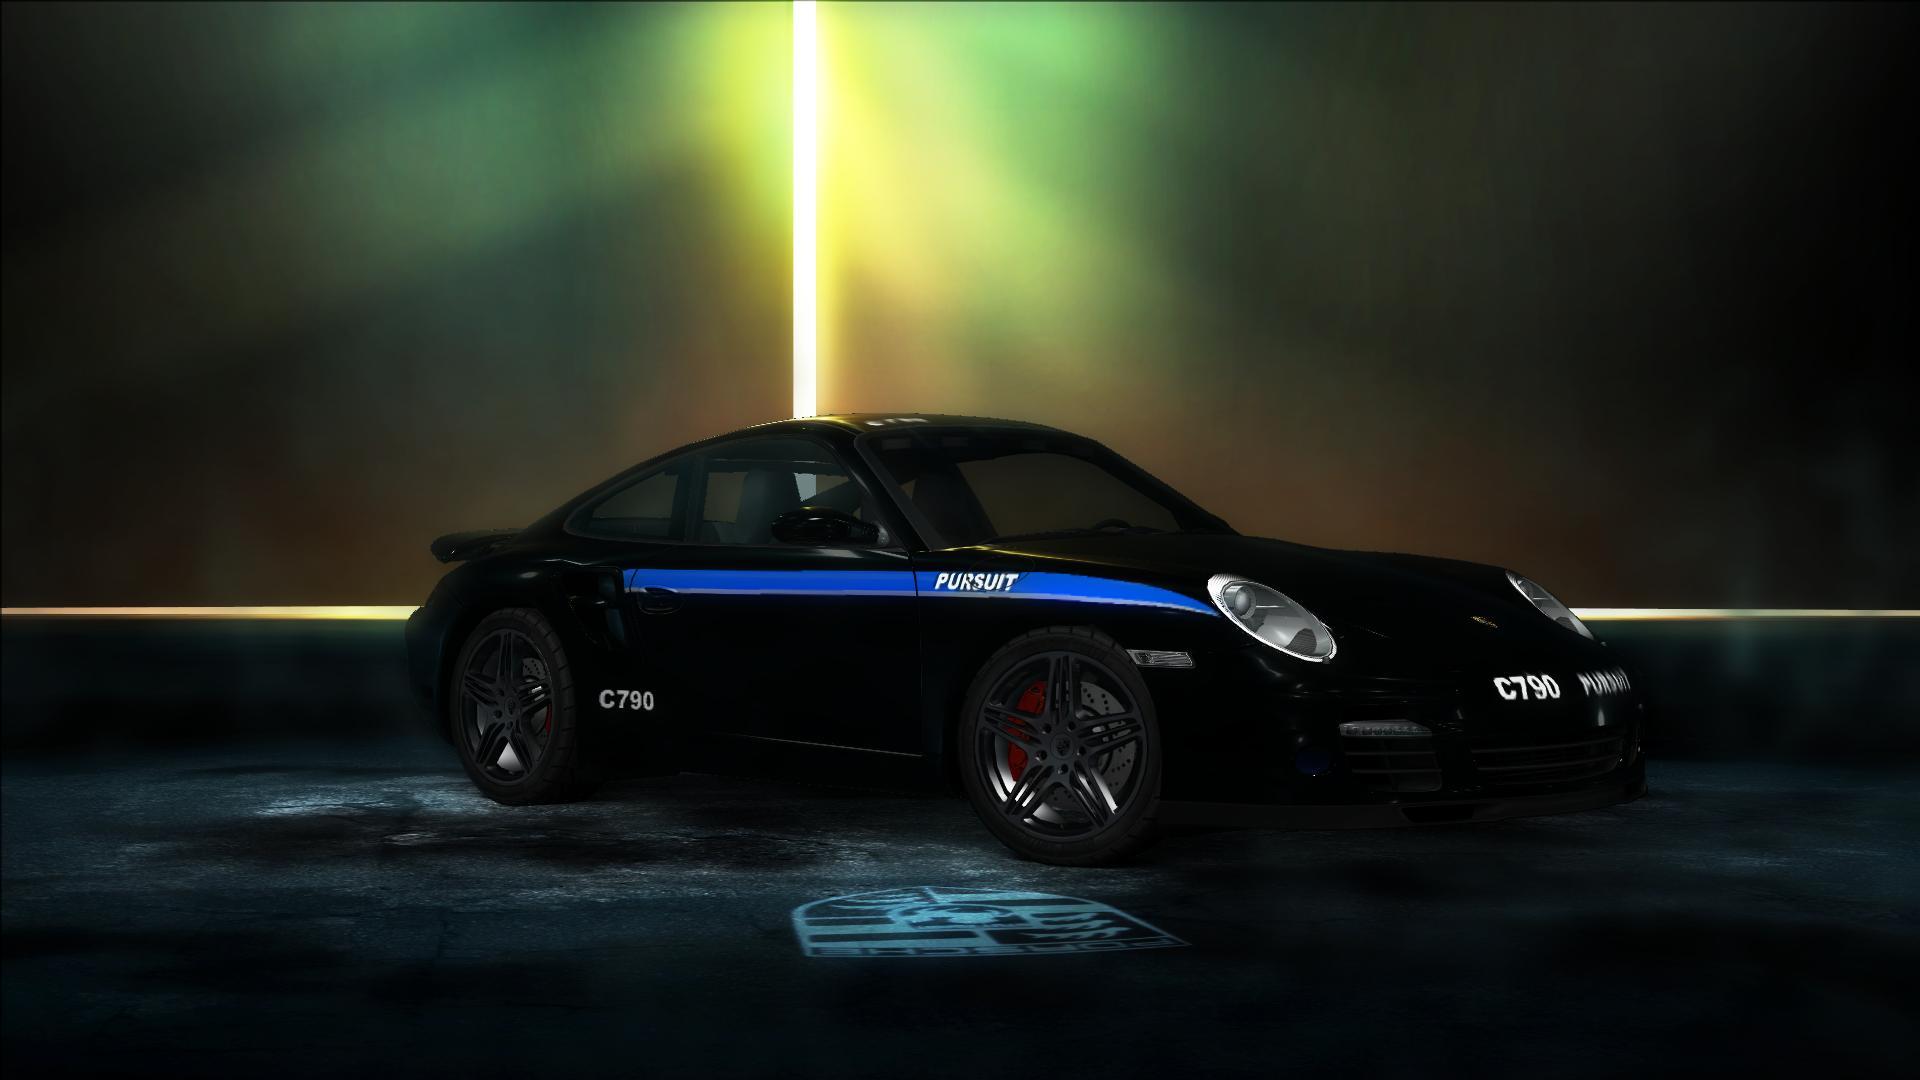 Porsche 911 Turbo Federal Sport Cruiser